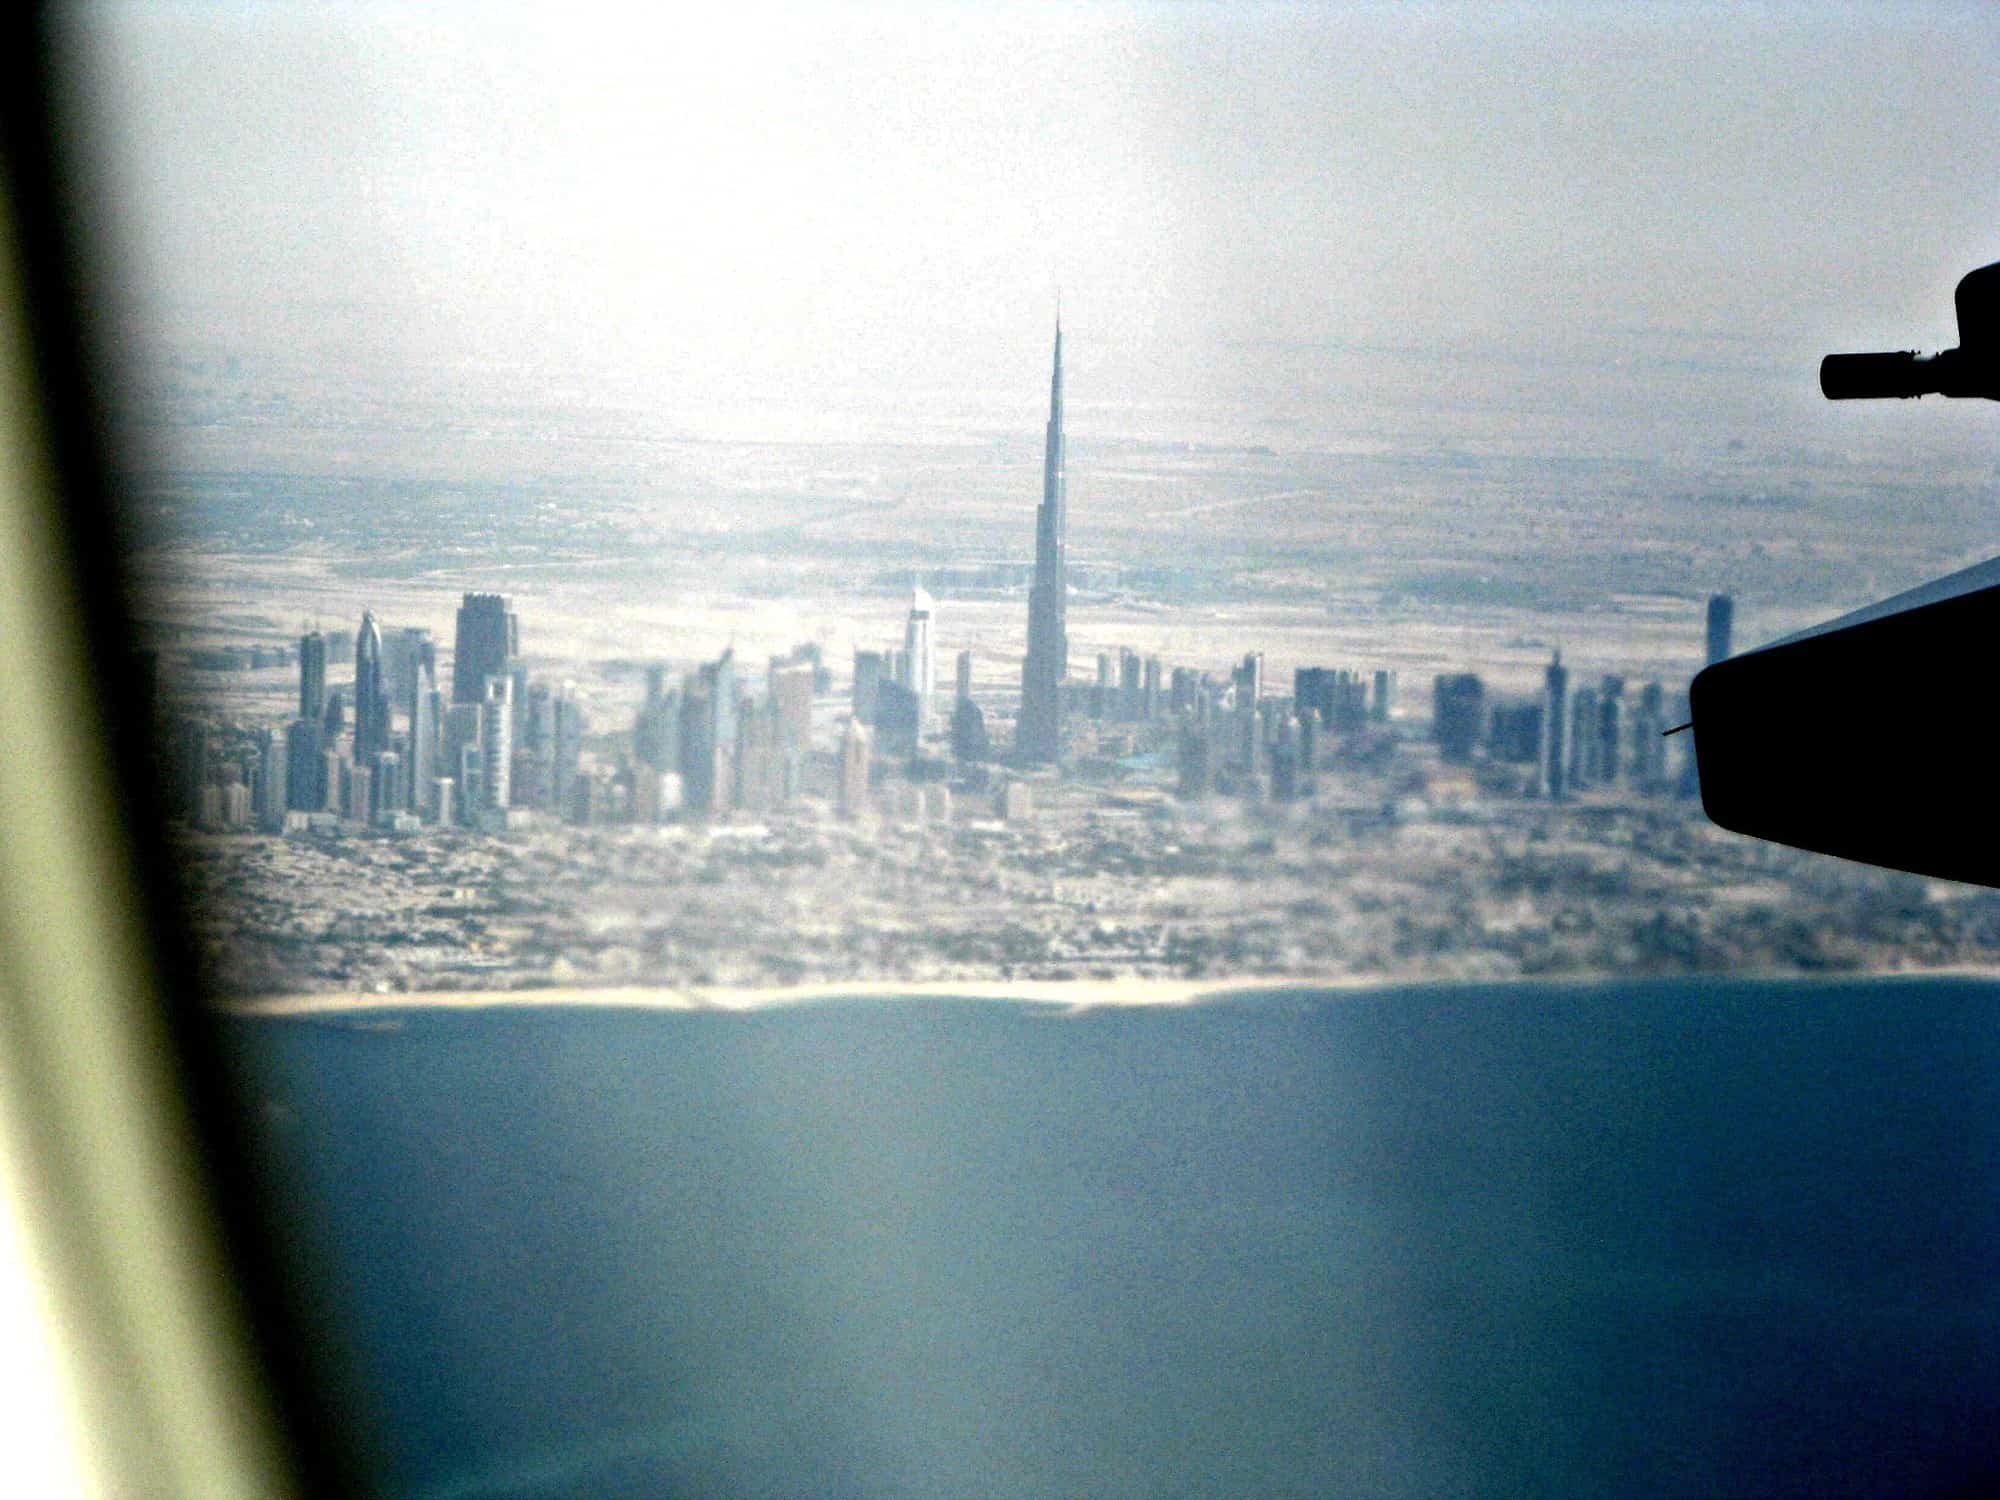 View of Dubai and the Burj Khalifa